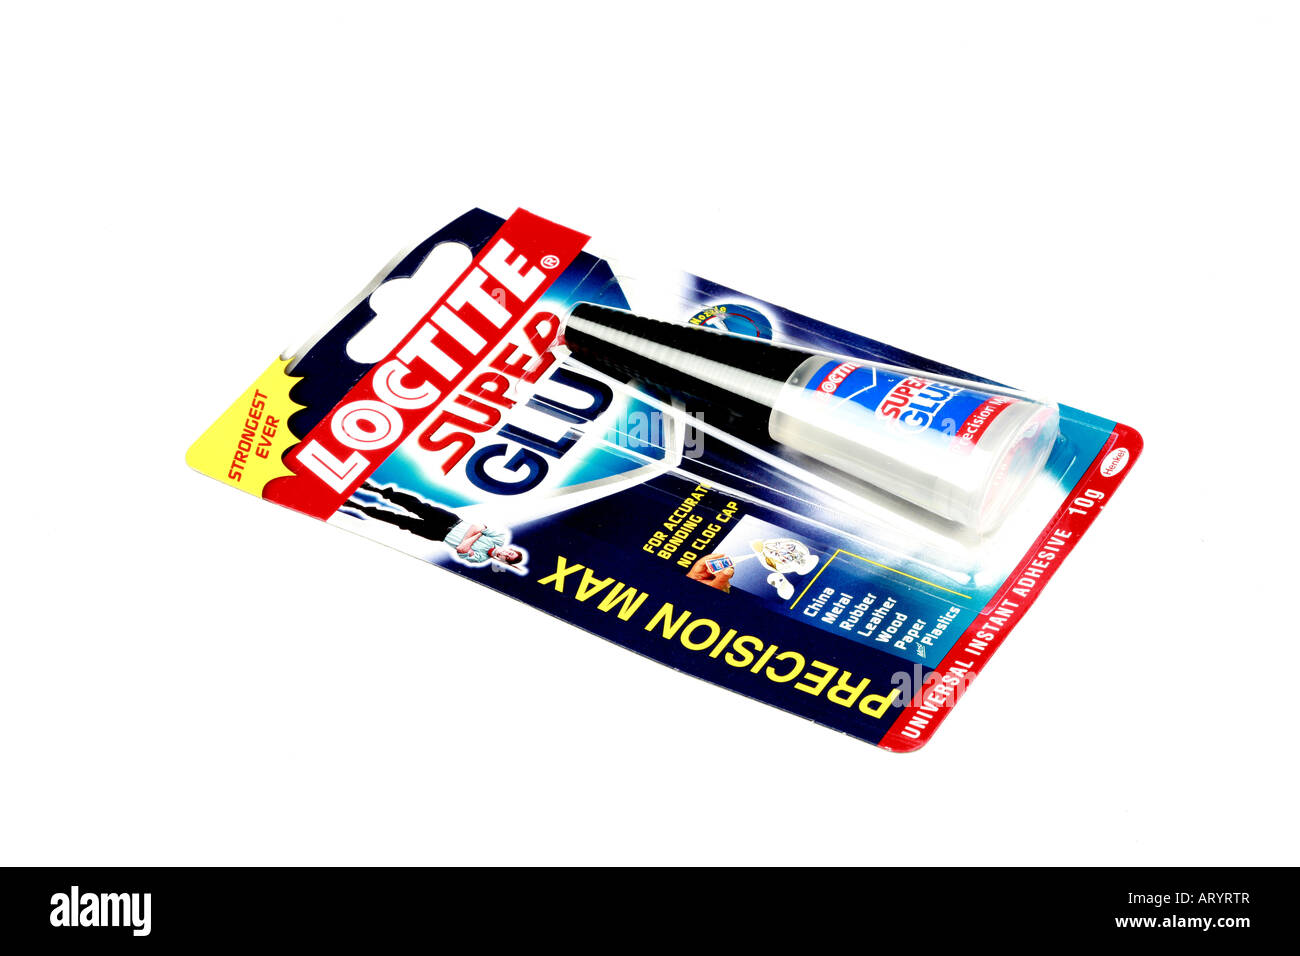 Super Glue Stock Photos & Super Glue Stock Images - Alamy